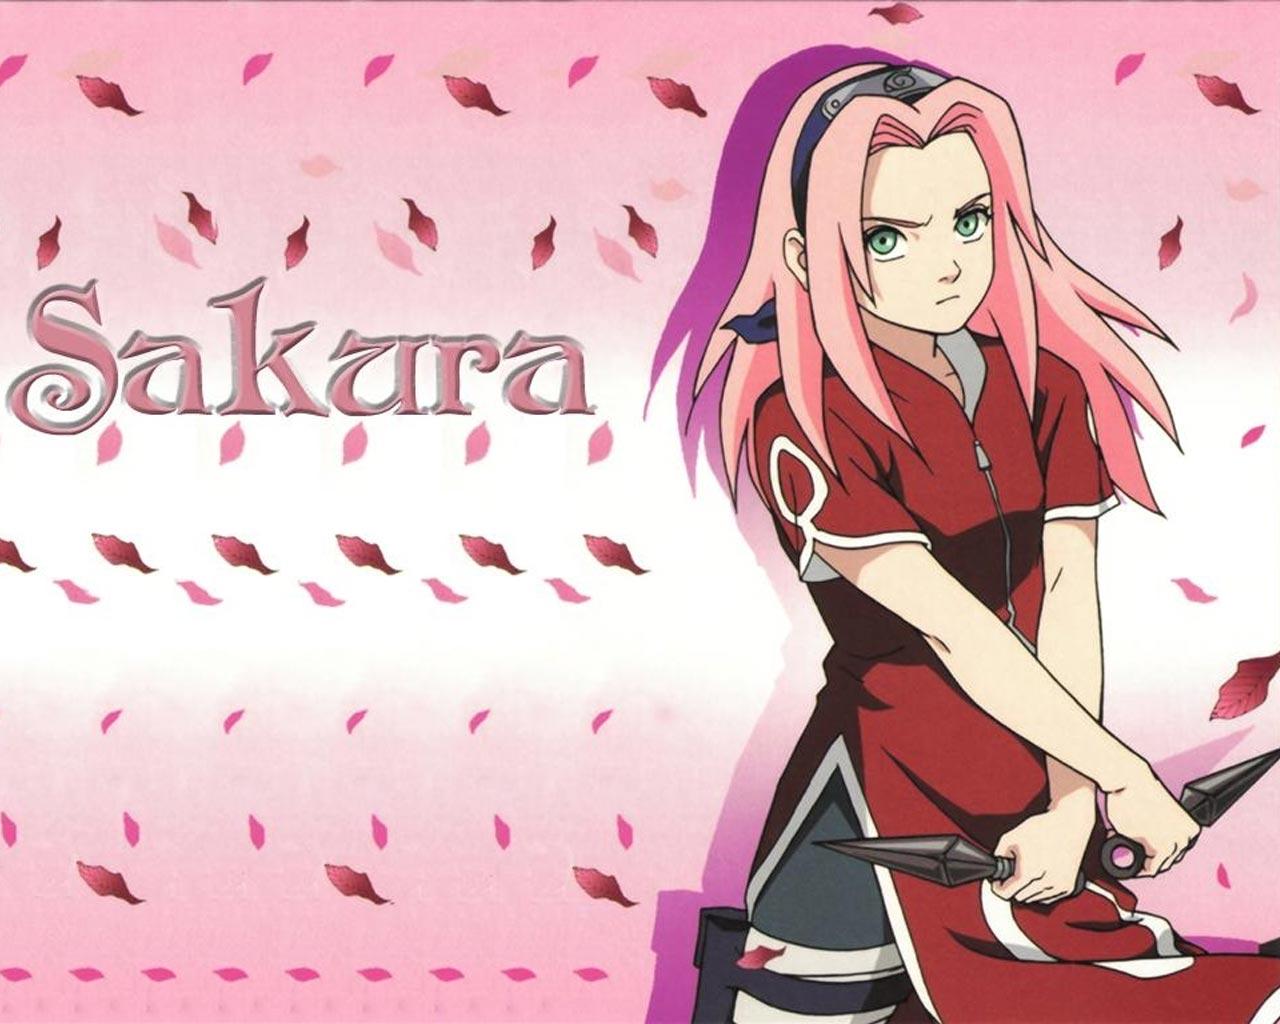 Wallpapers Desktops Sakura Haruno Wallpaper